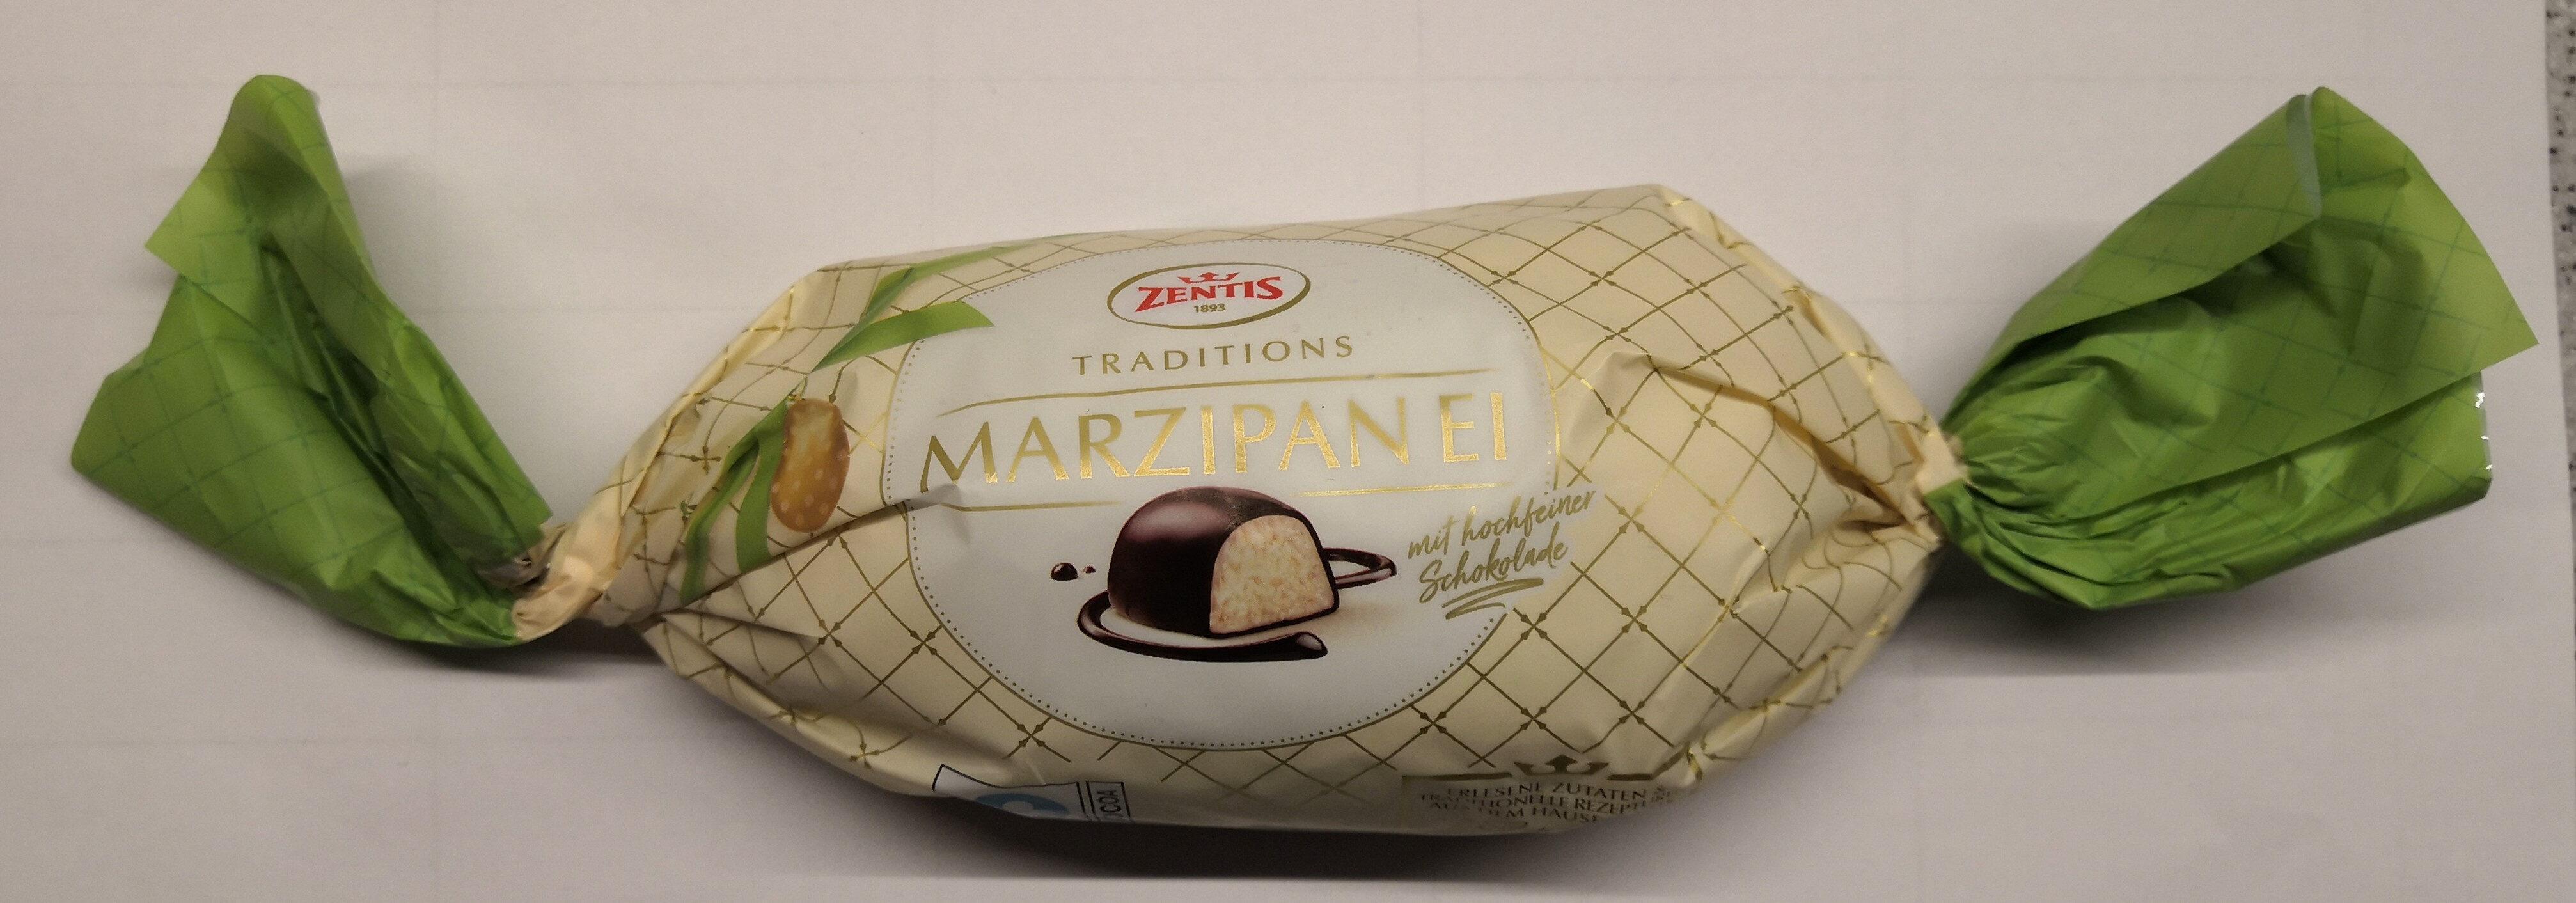 Marzipan-Ei - Product - de